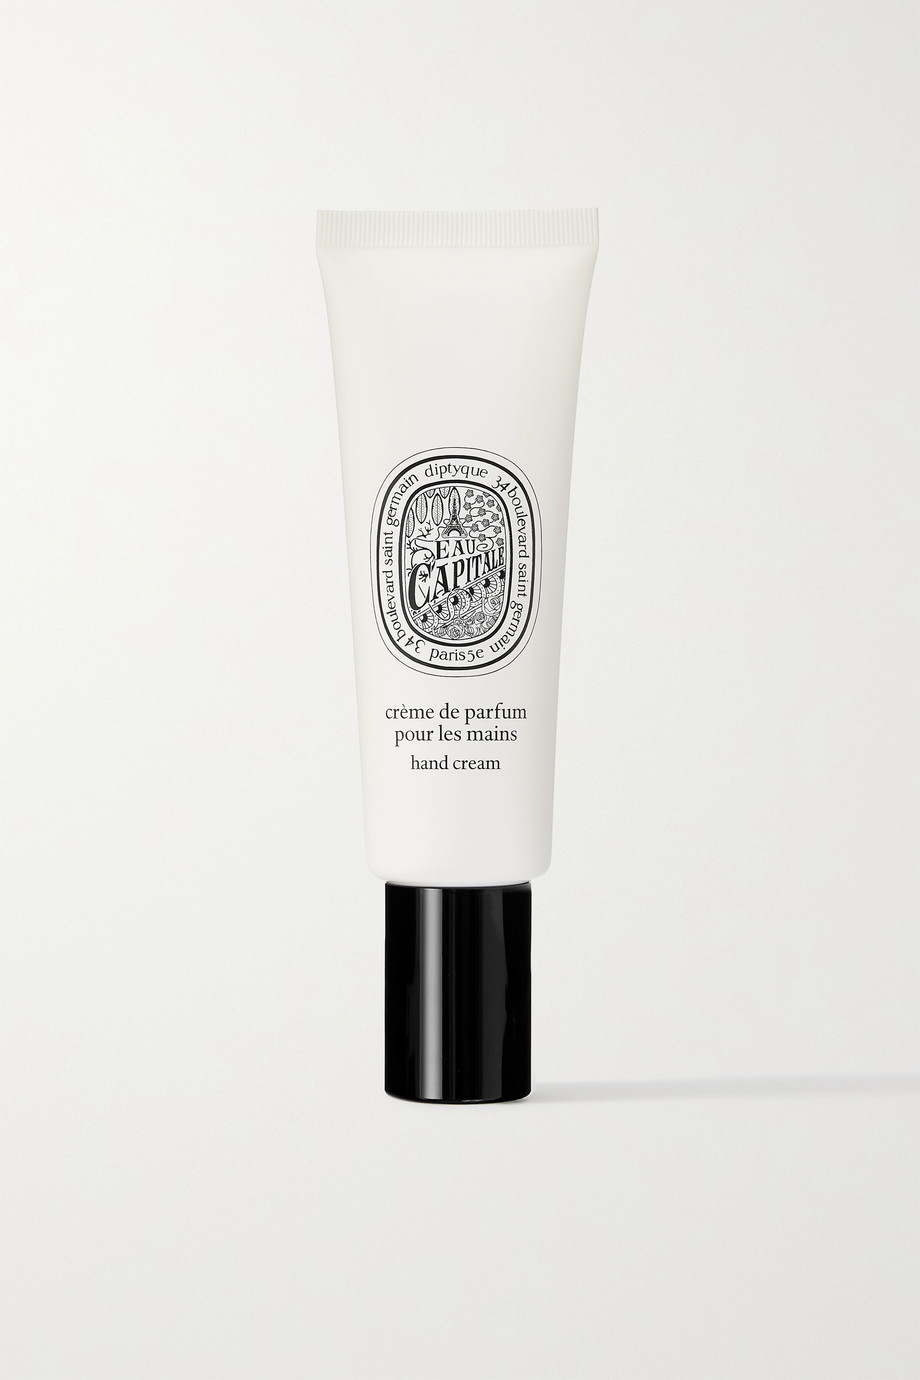 Diptyque Hand Cream – Eau Capitale, 45 ml – Handcreme